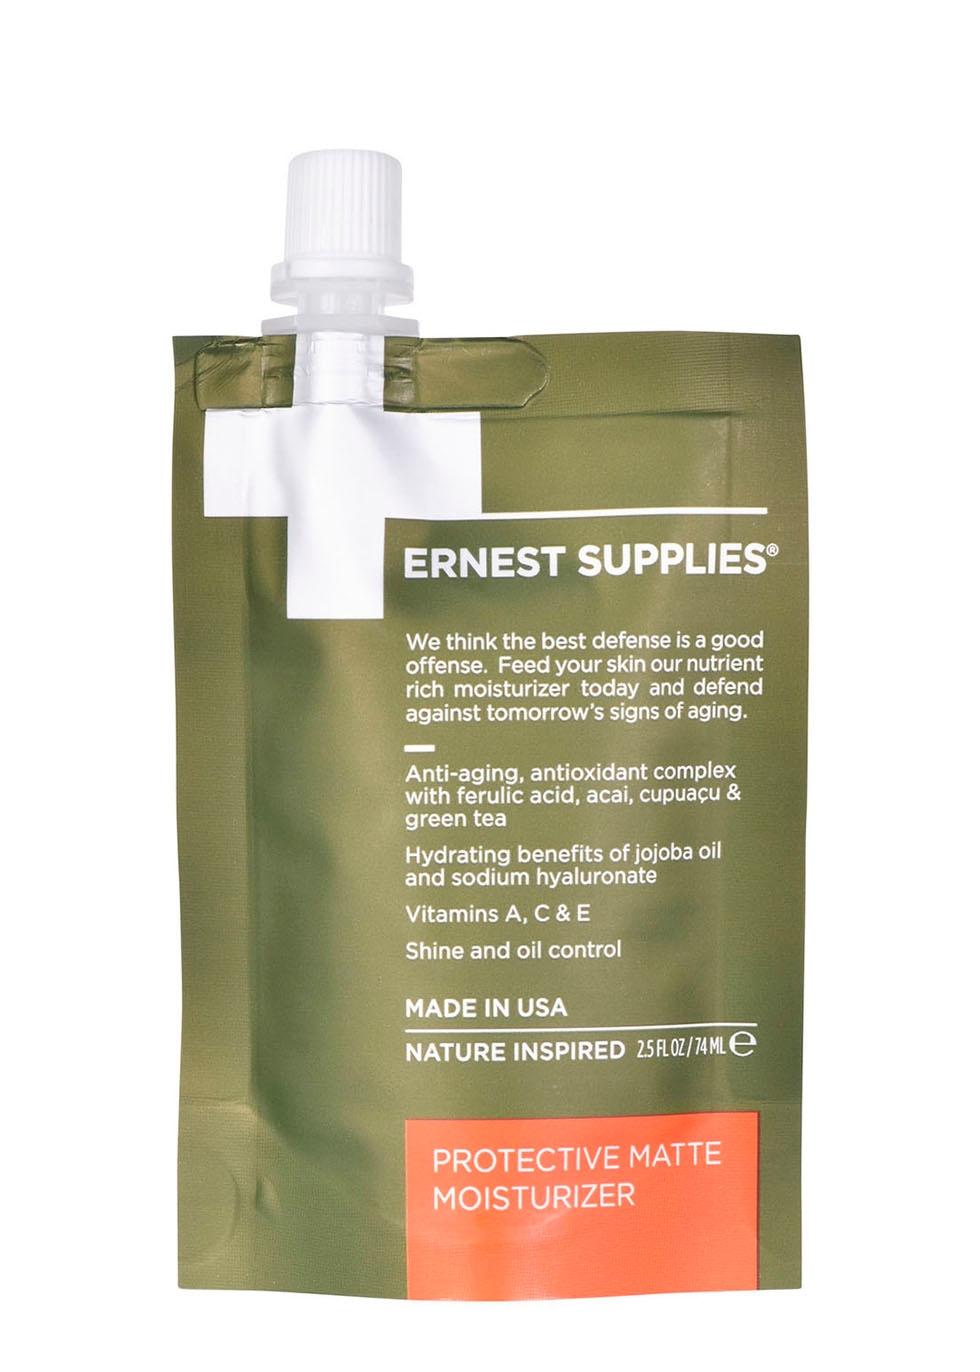 Mens Luxury Skin Care Harvey Nichols Twin Pack Ovale Micellar Water Brightening 200ml